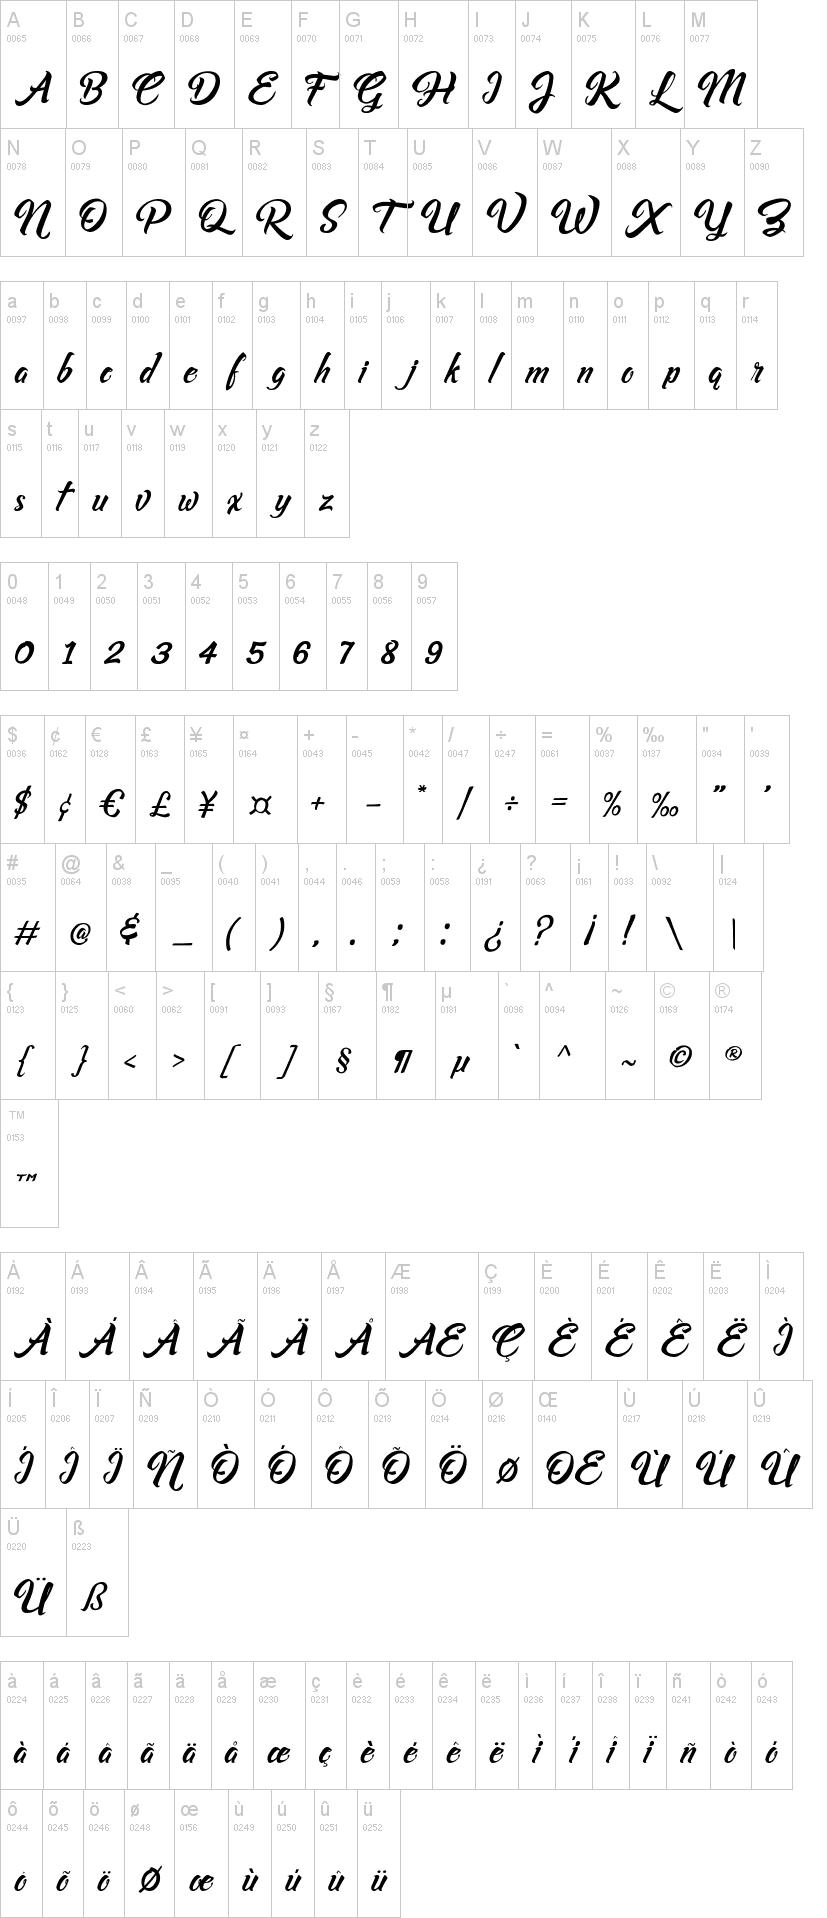 Rashfeng Font-1